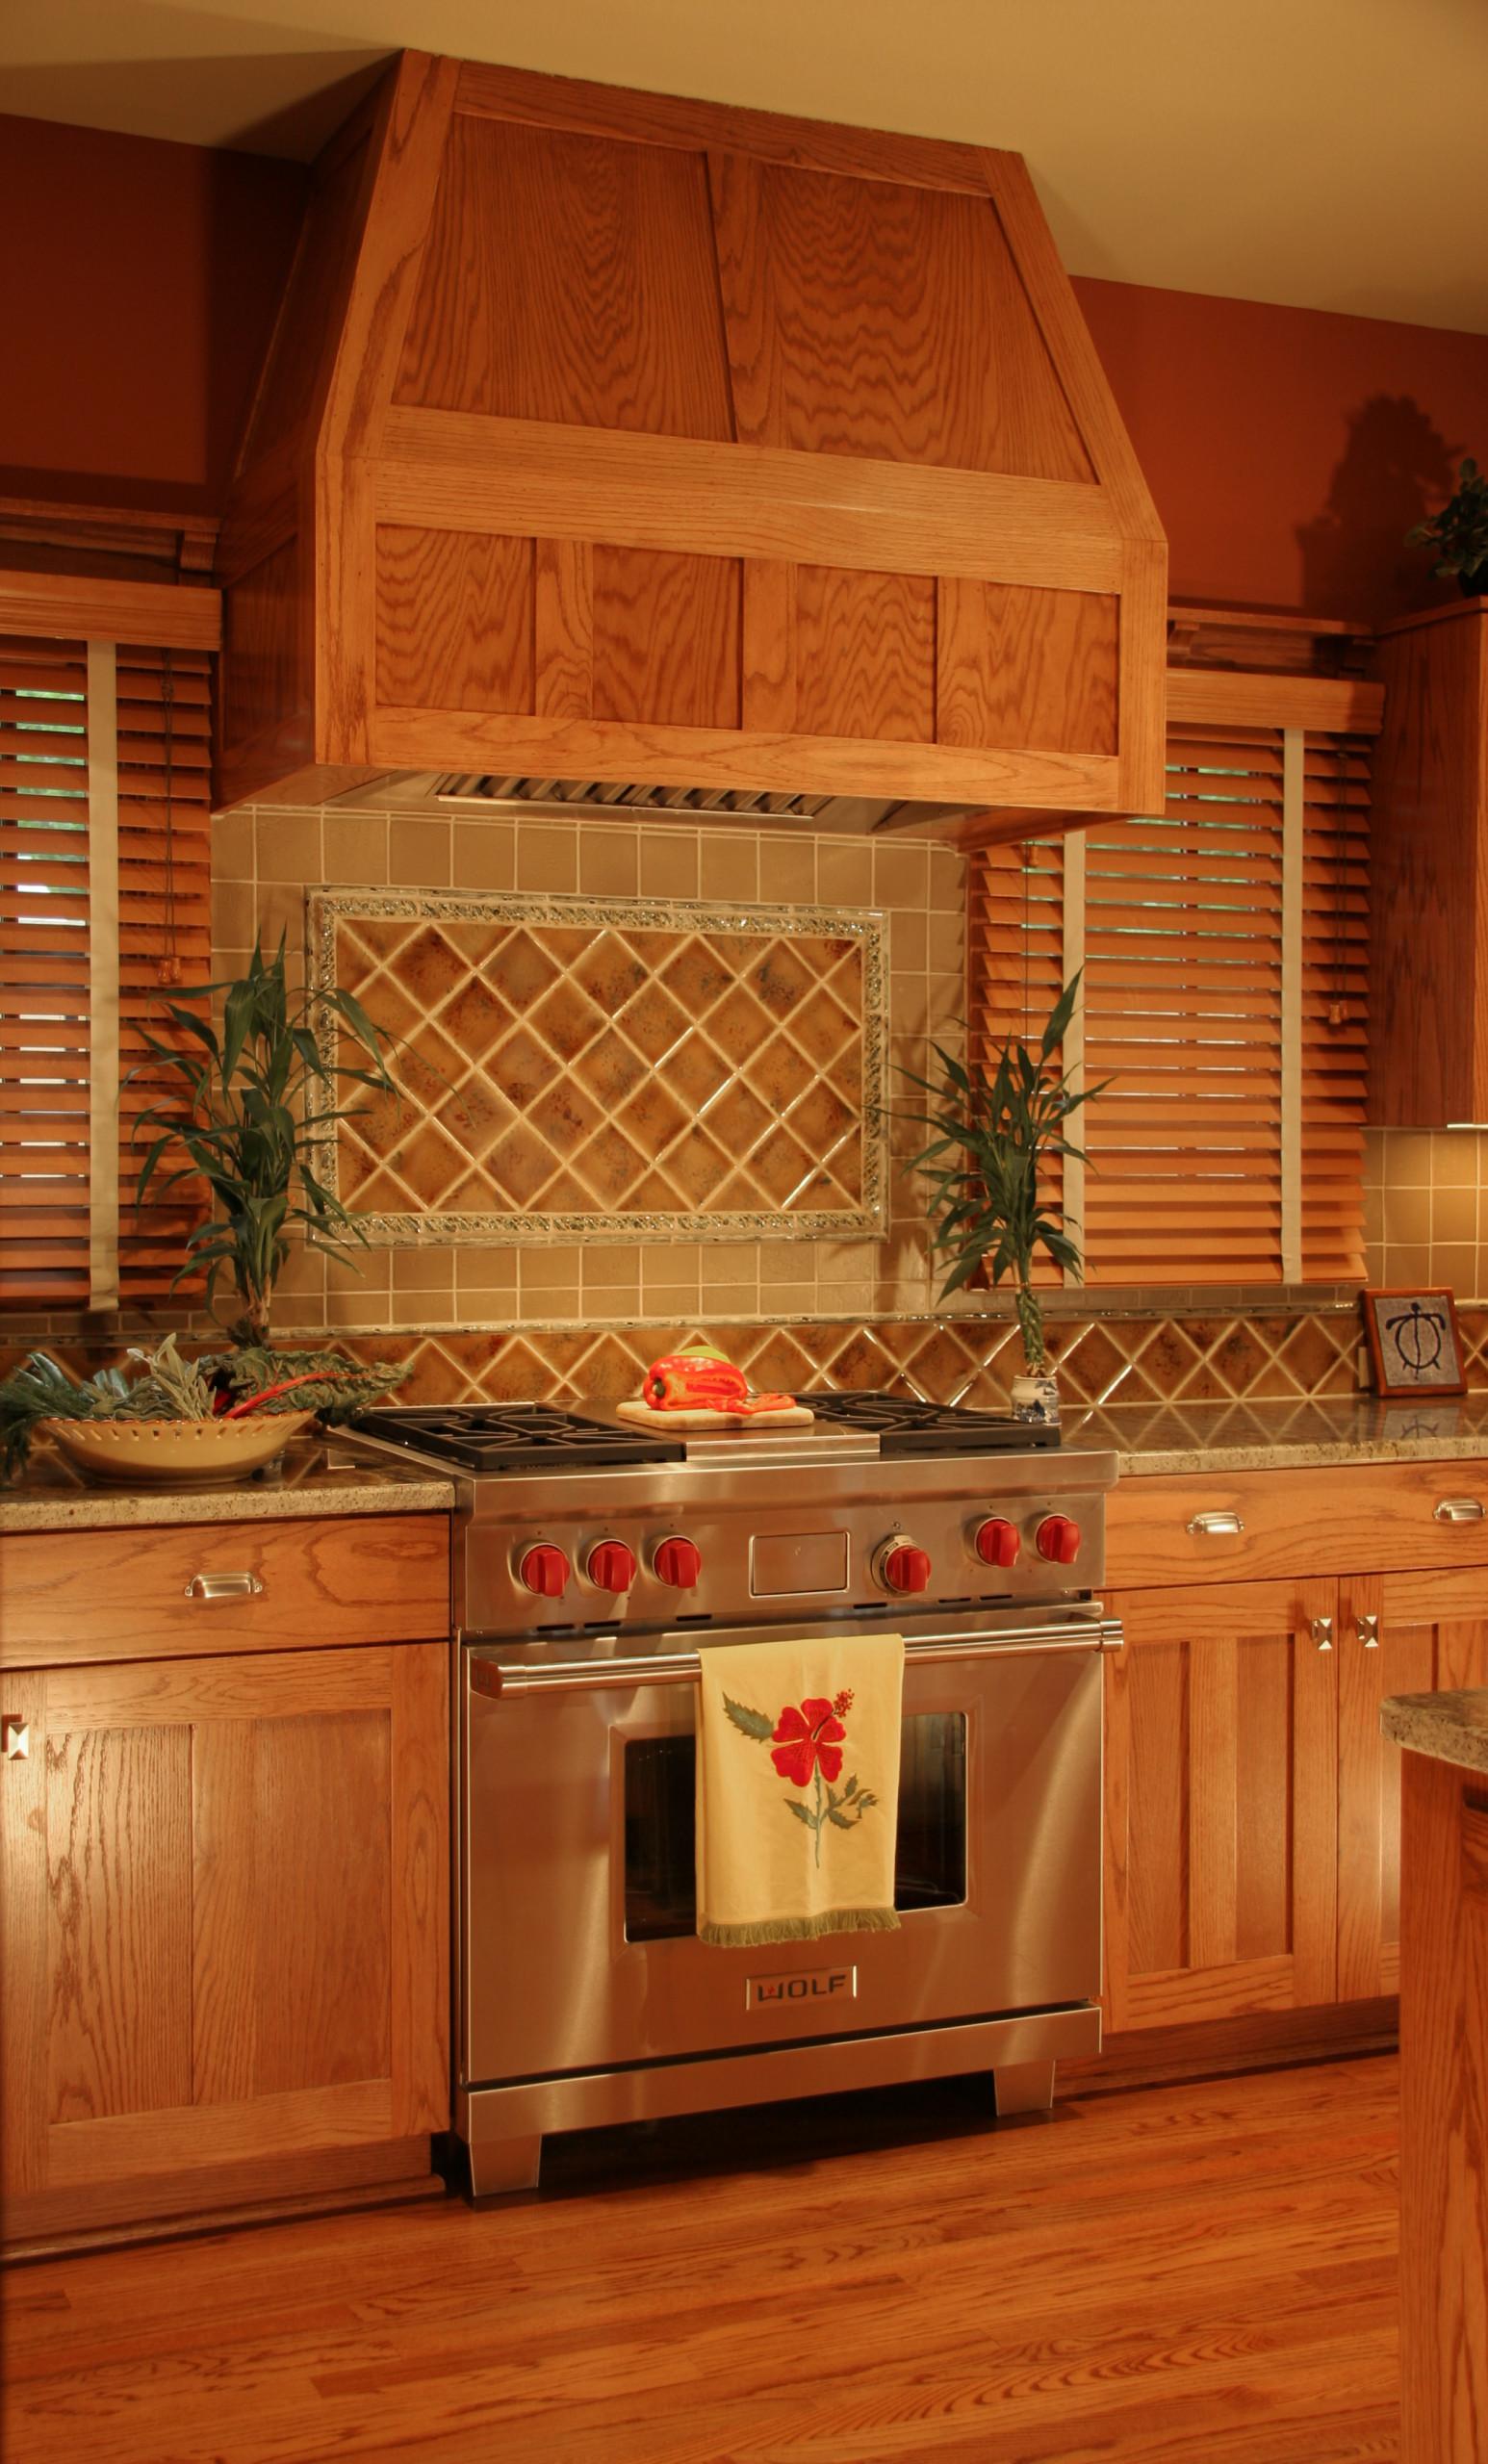 Bungalow Kitchen Range Detail